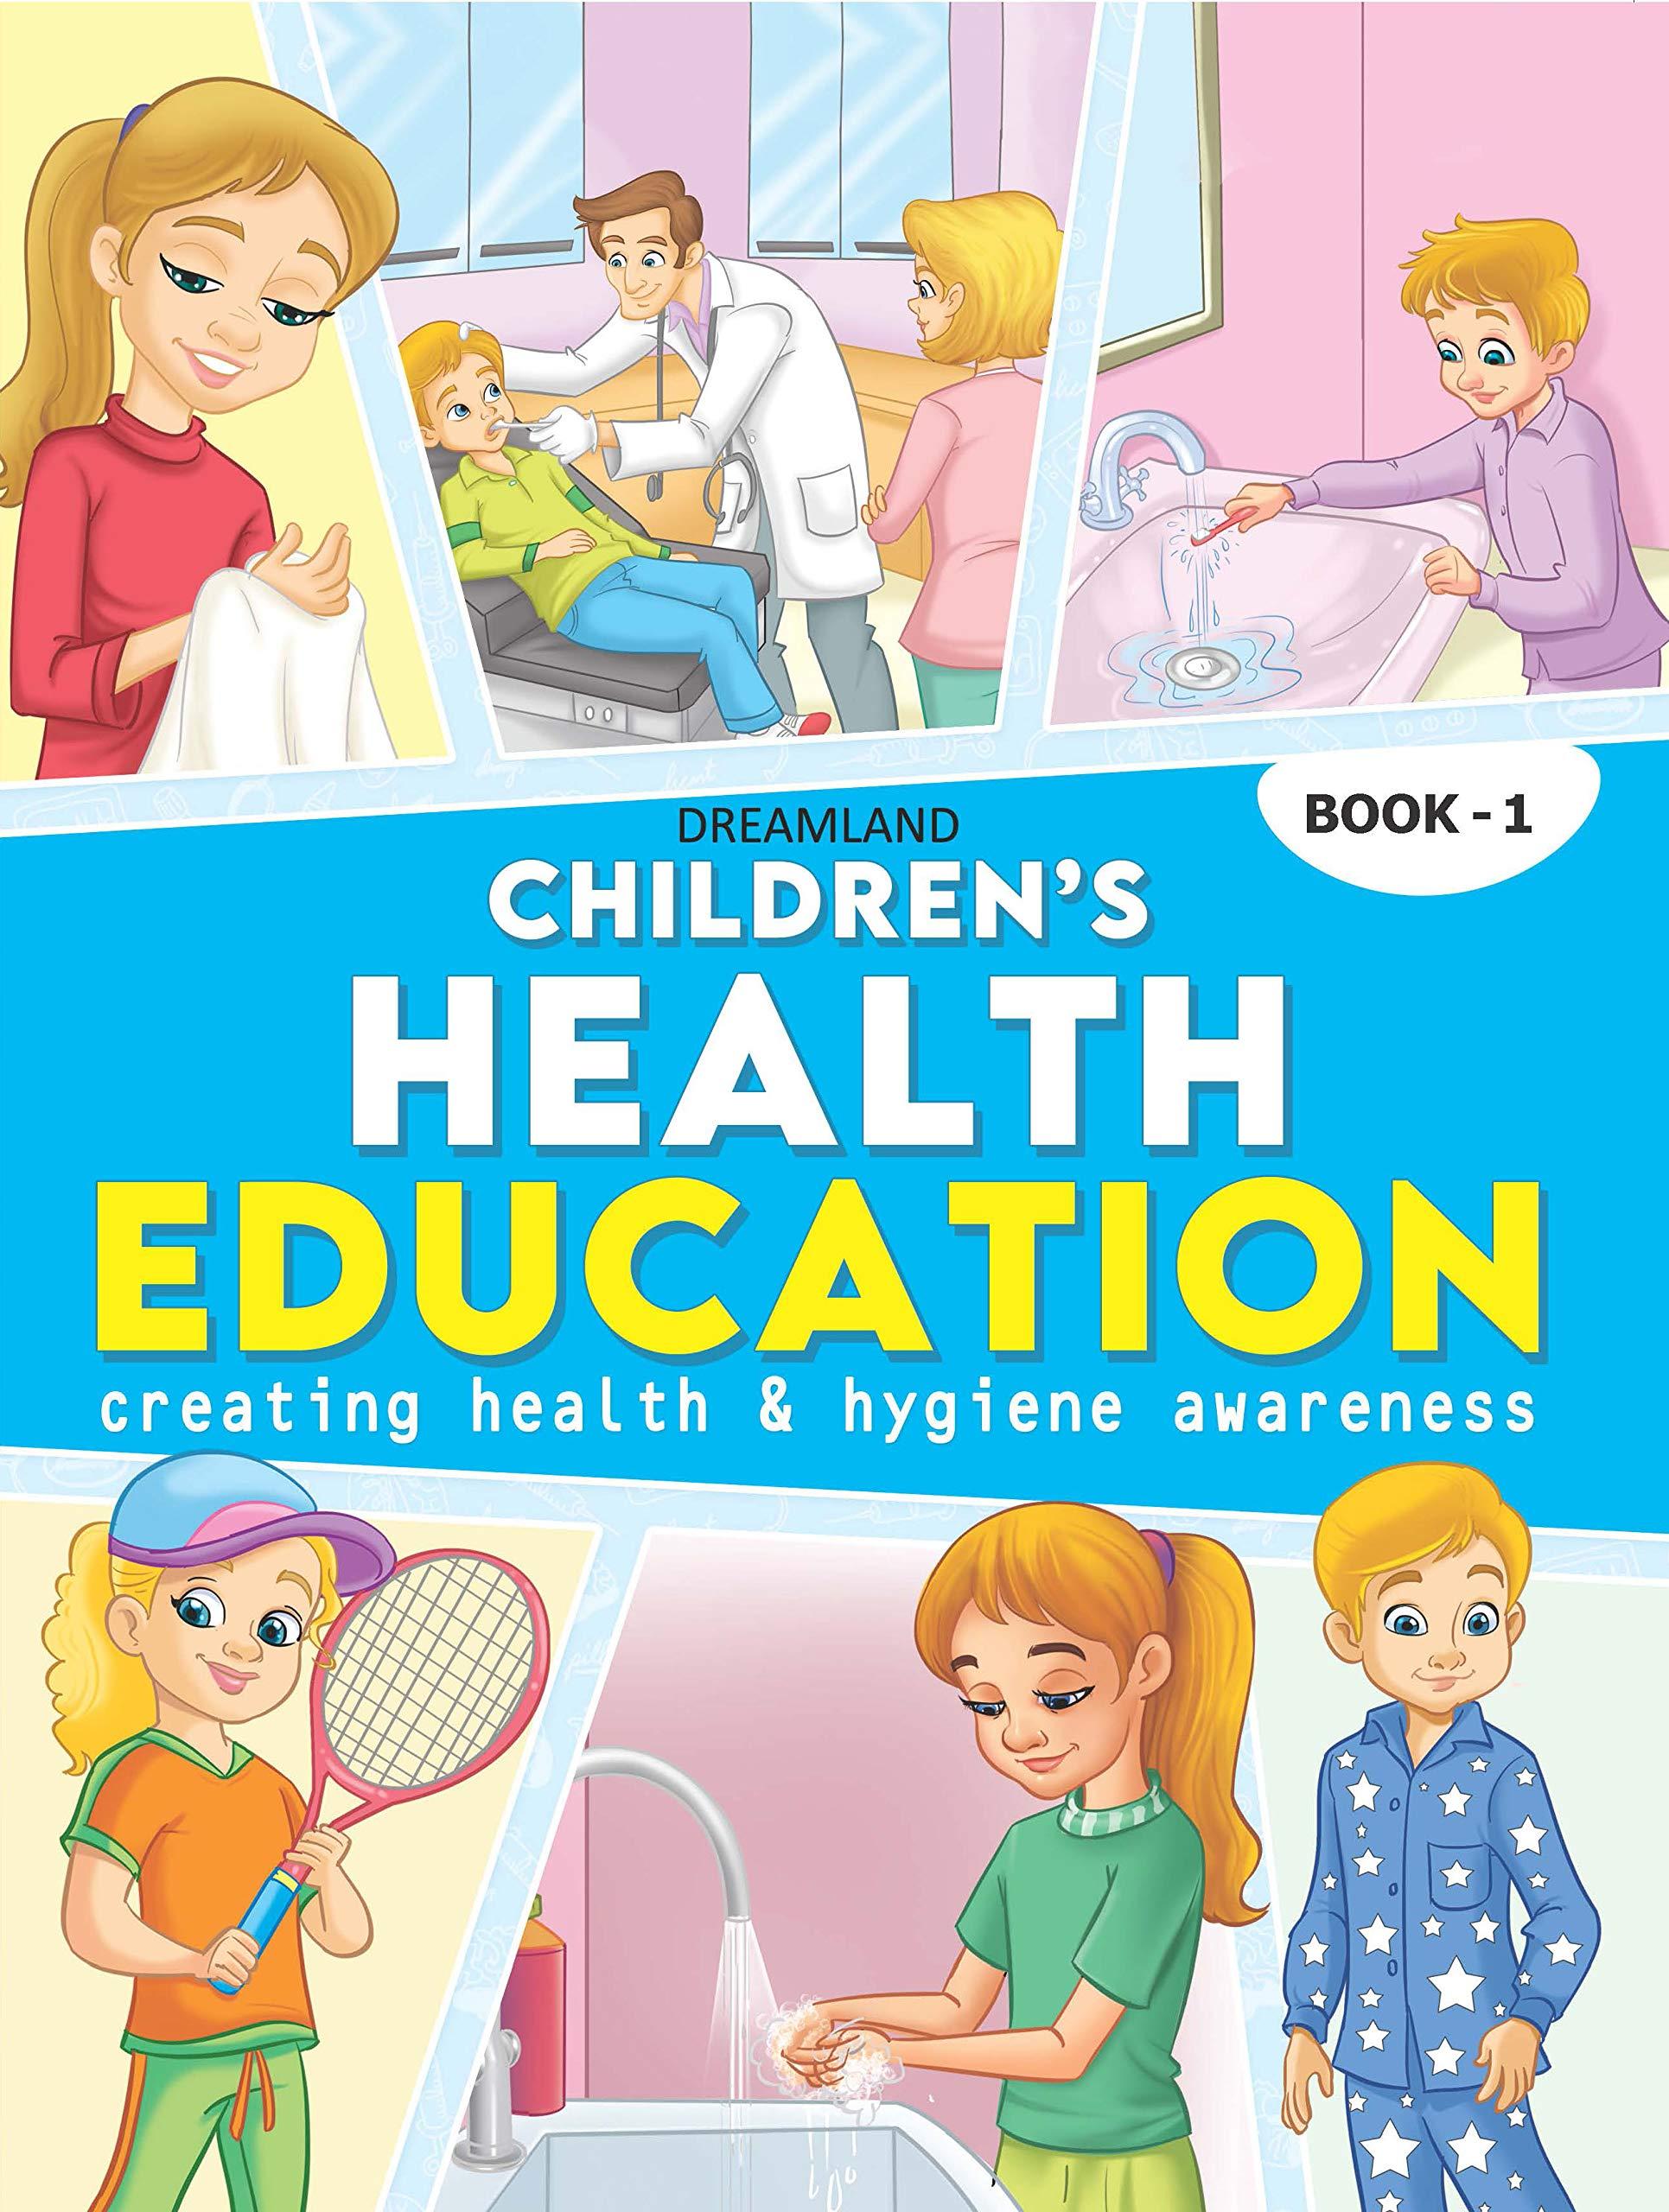 Children's Health Education - Book 1